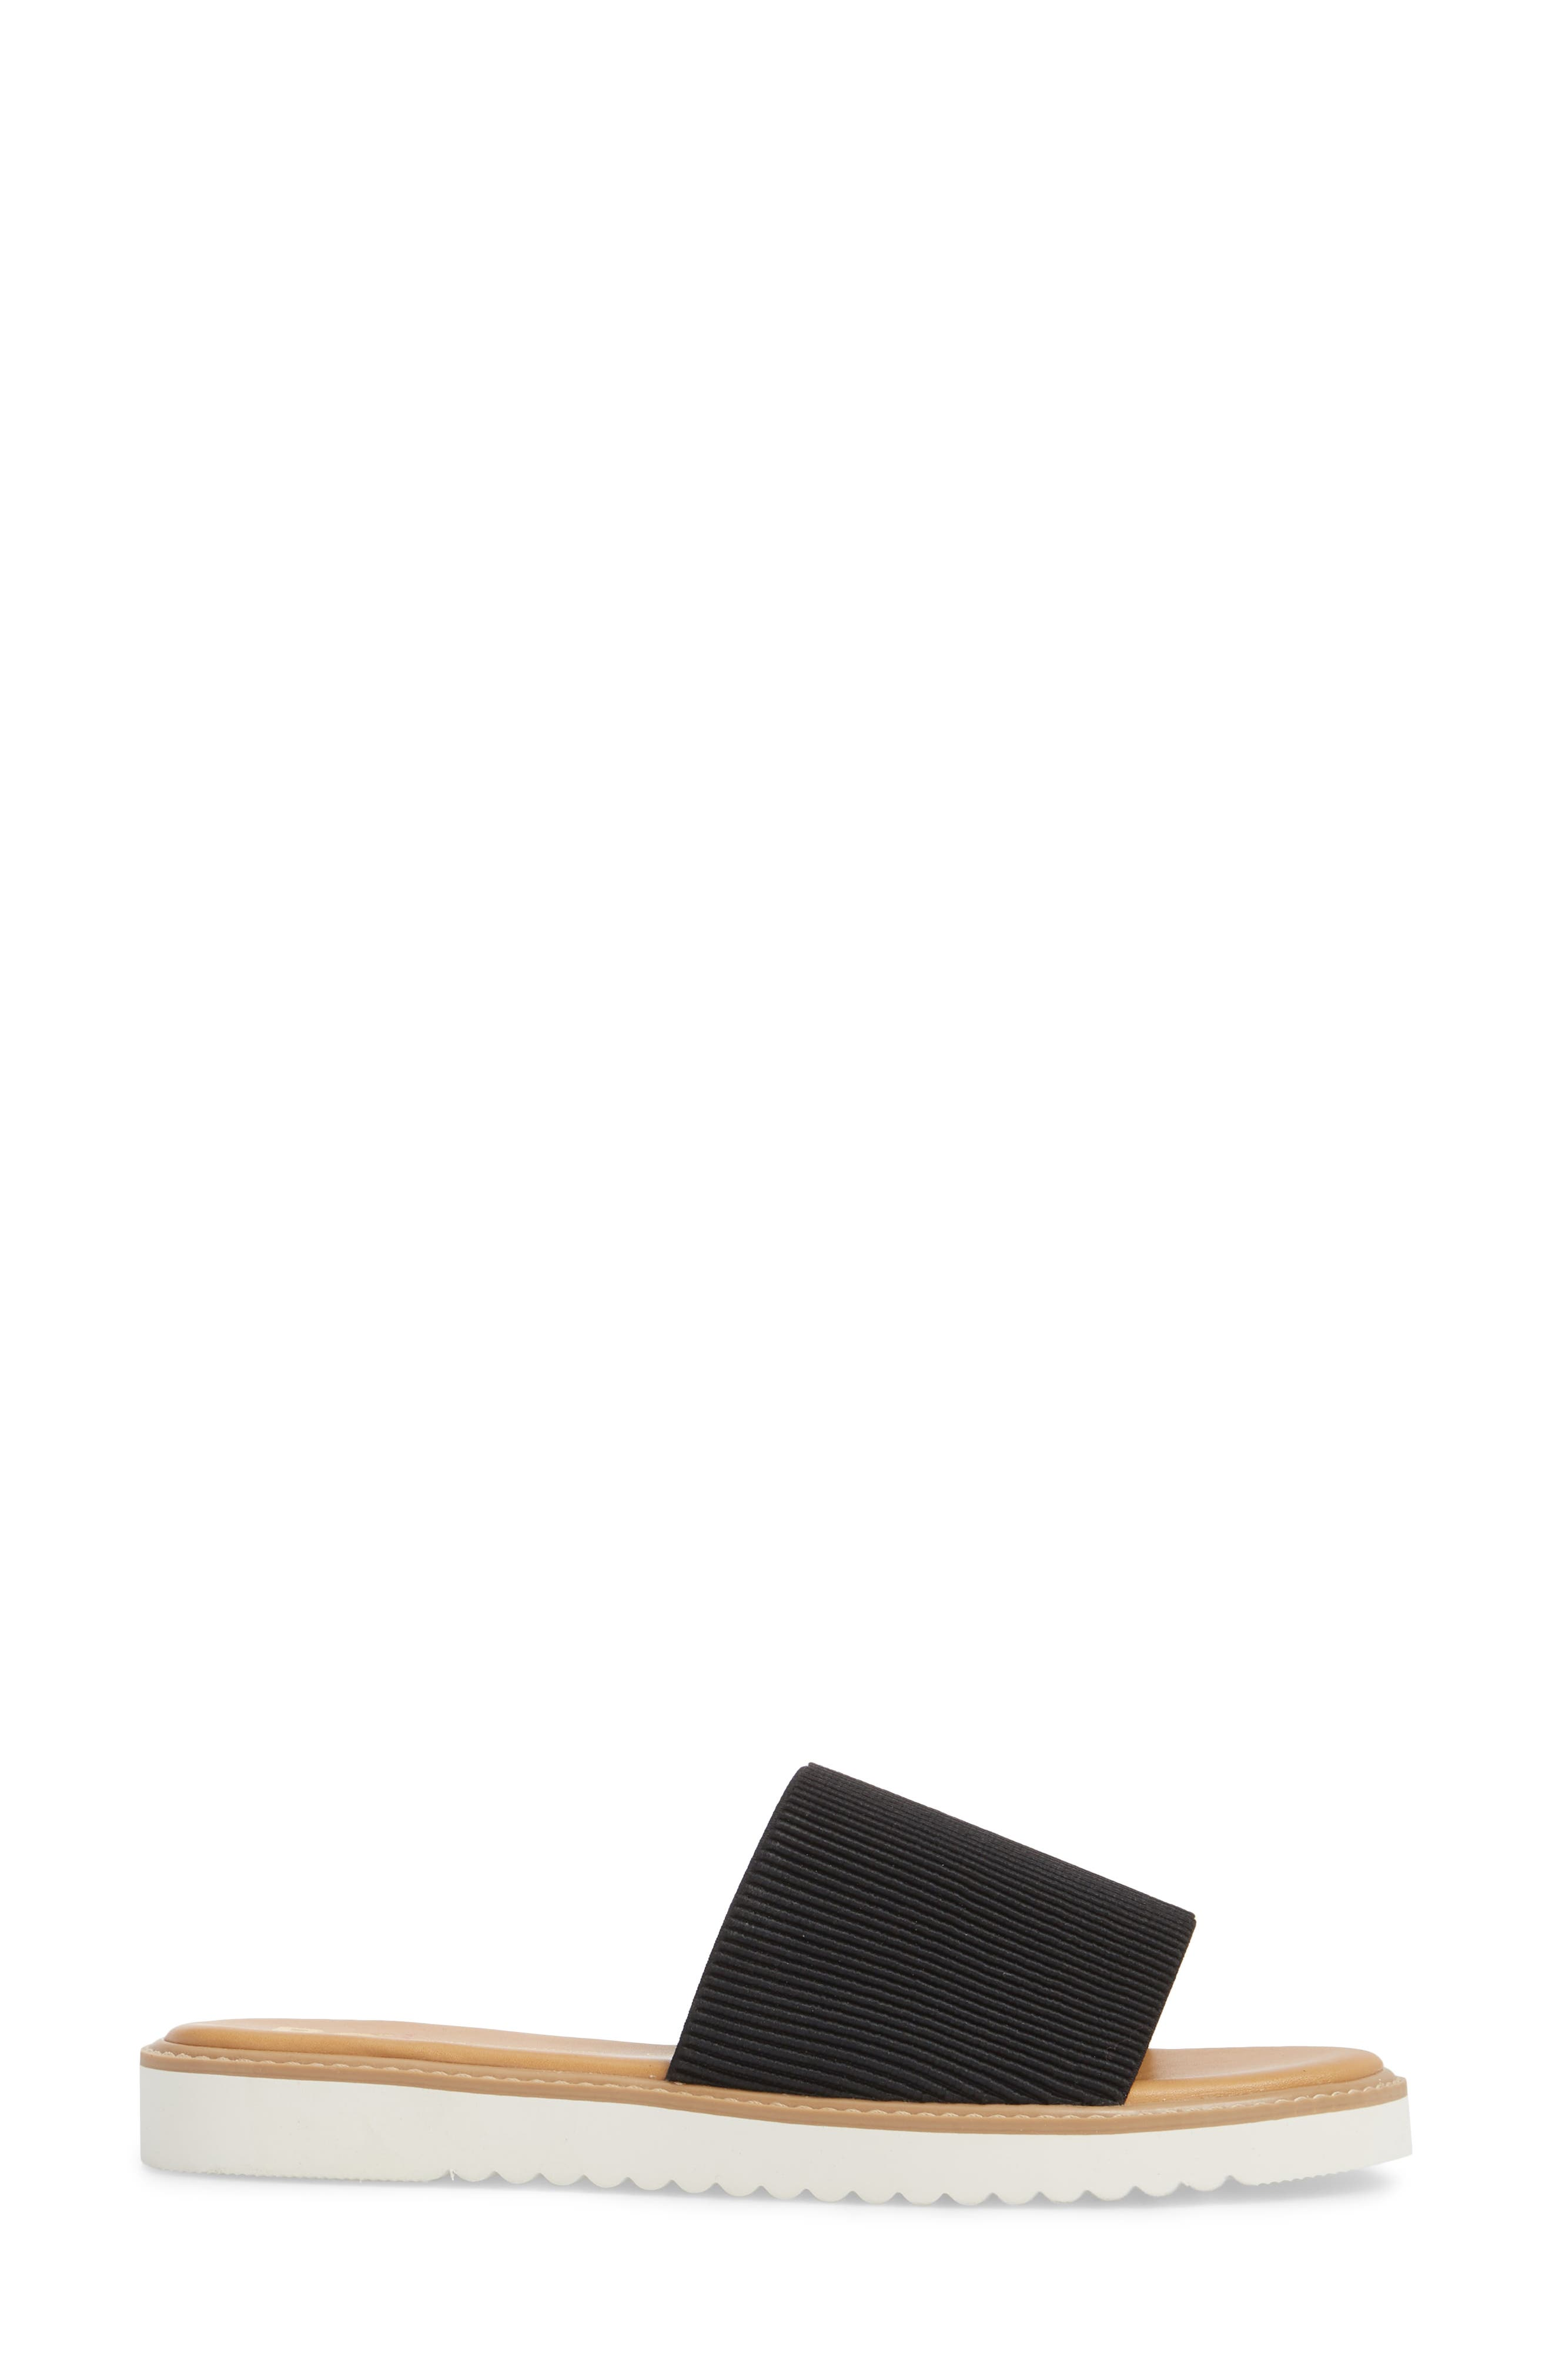 Cotton Candy Slide Sandal,                             Alternate thumbnail 3, color,                             001